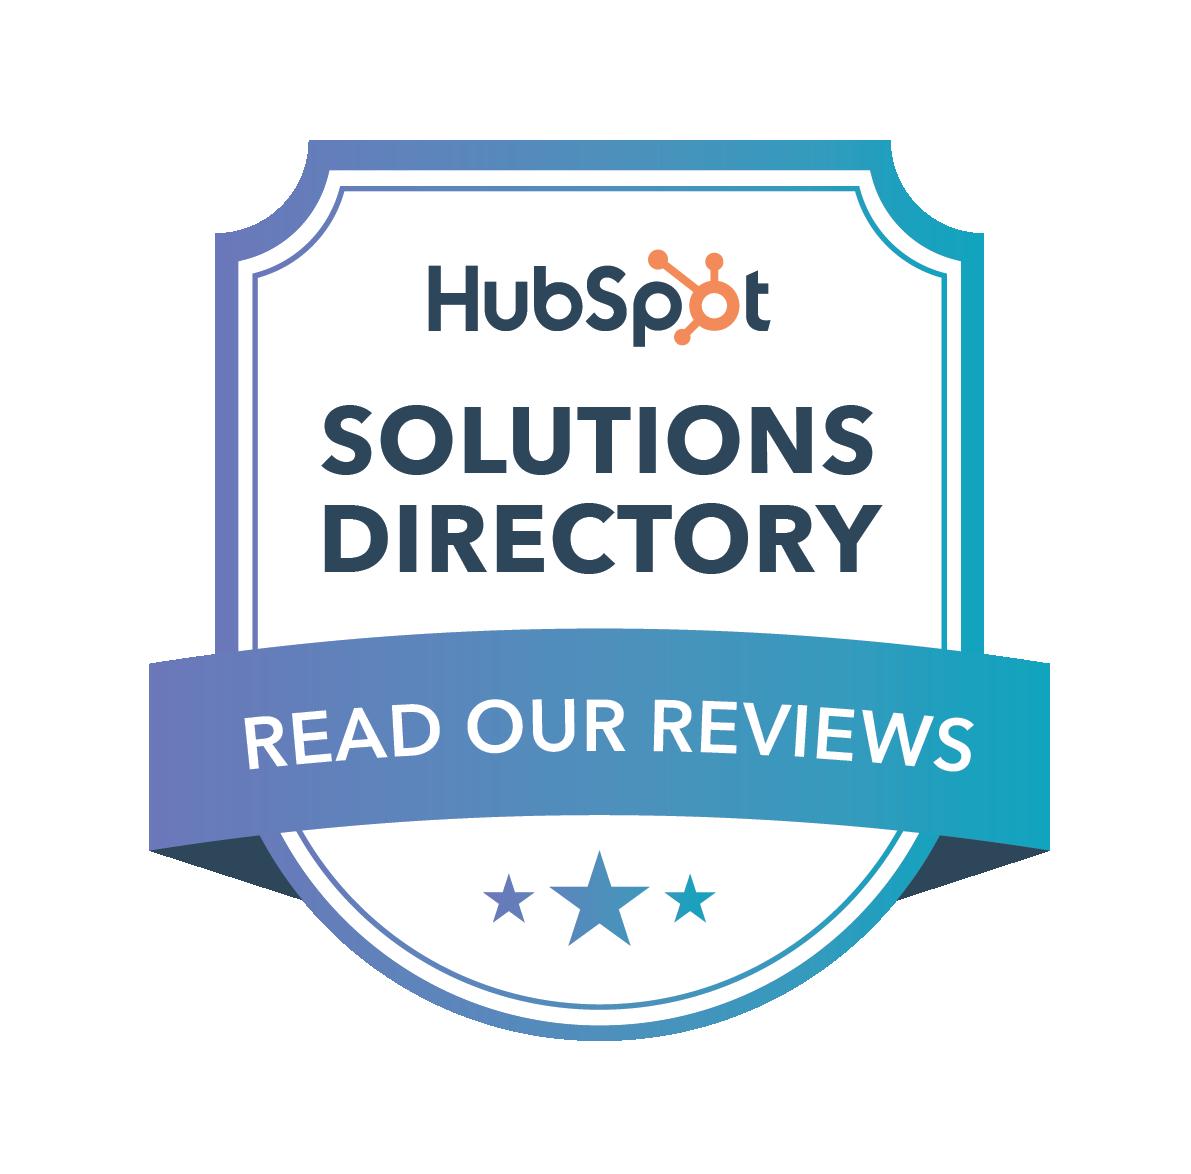 HubSpot Solutions Directory Badge